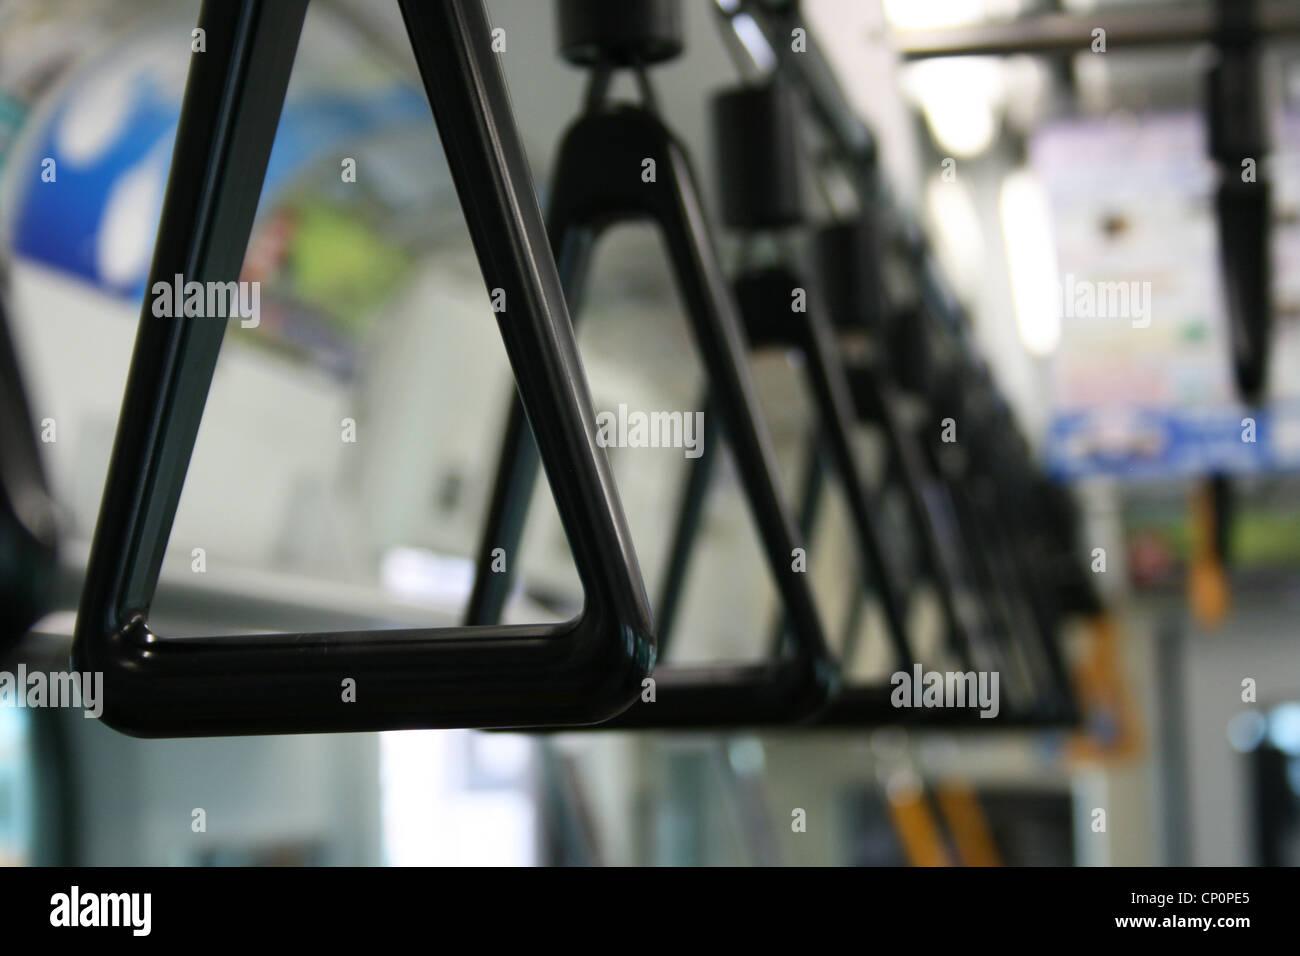 Close up of handles in a subway train, Tokyo Japan. - Stock Image